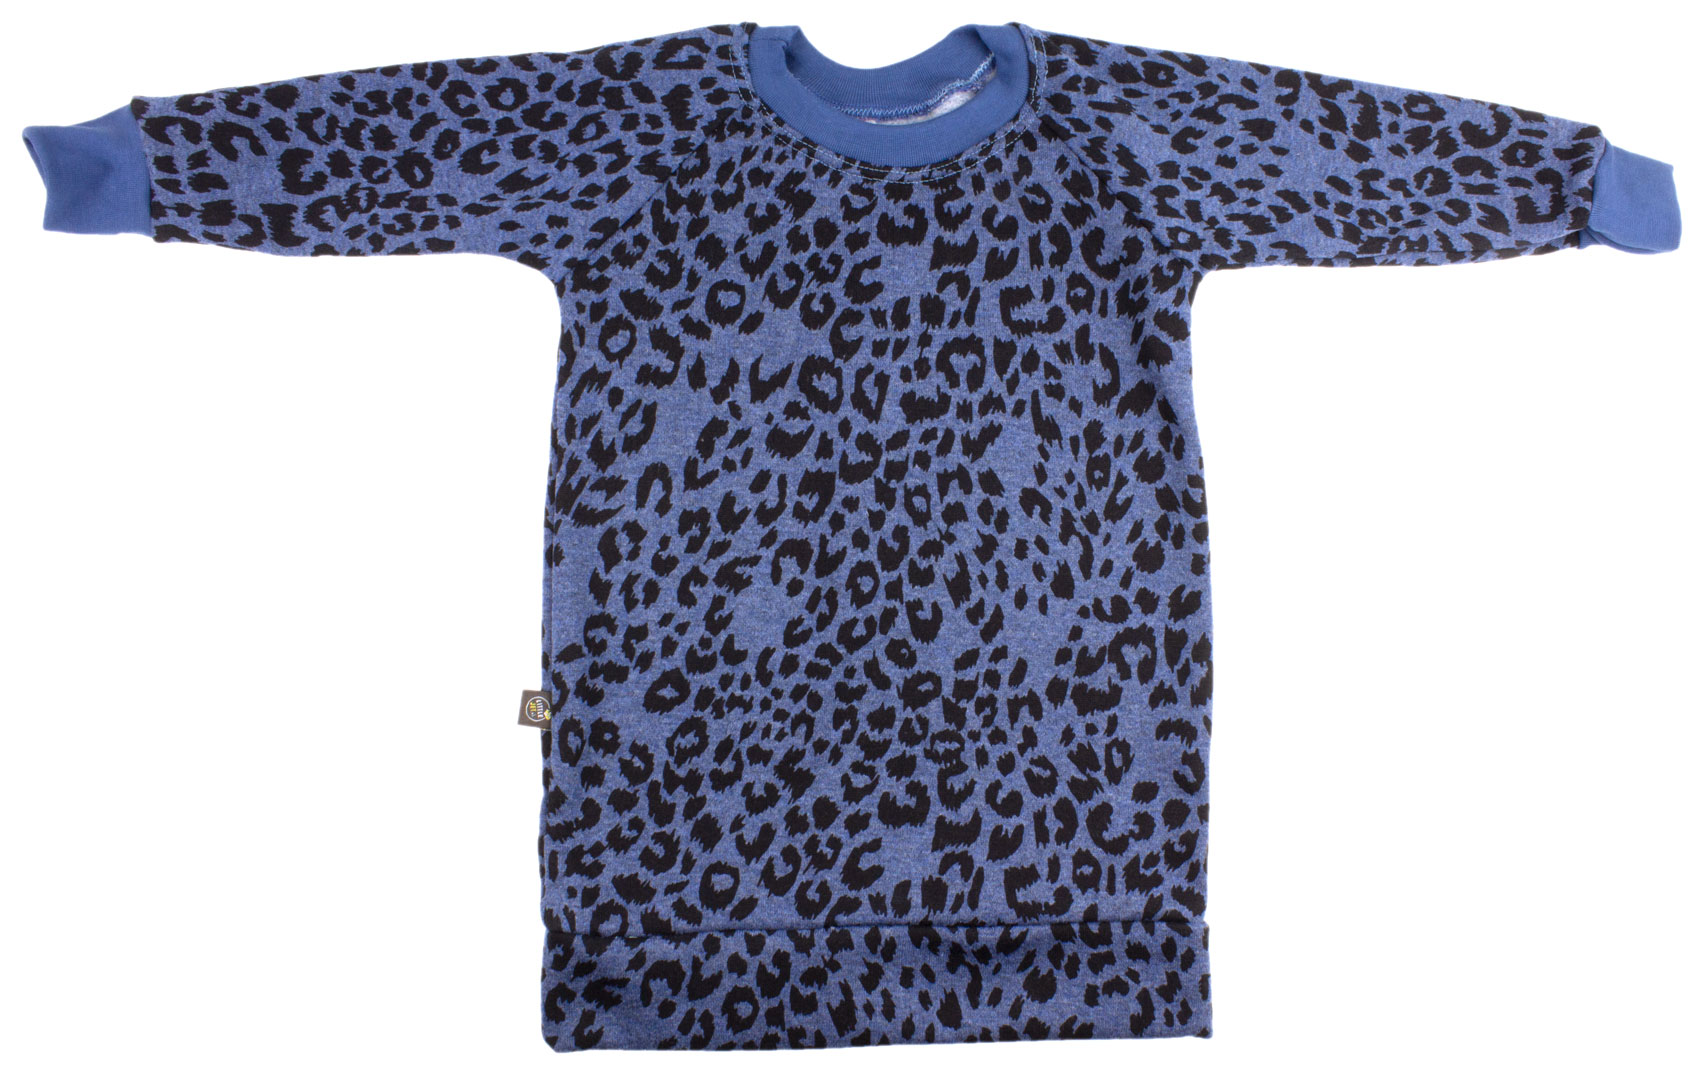 jeansblauw met panterprint